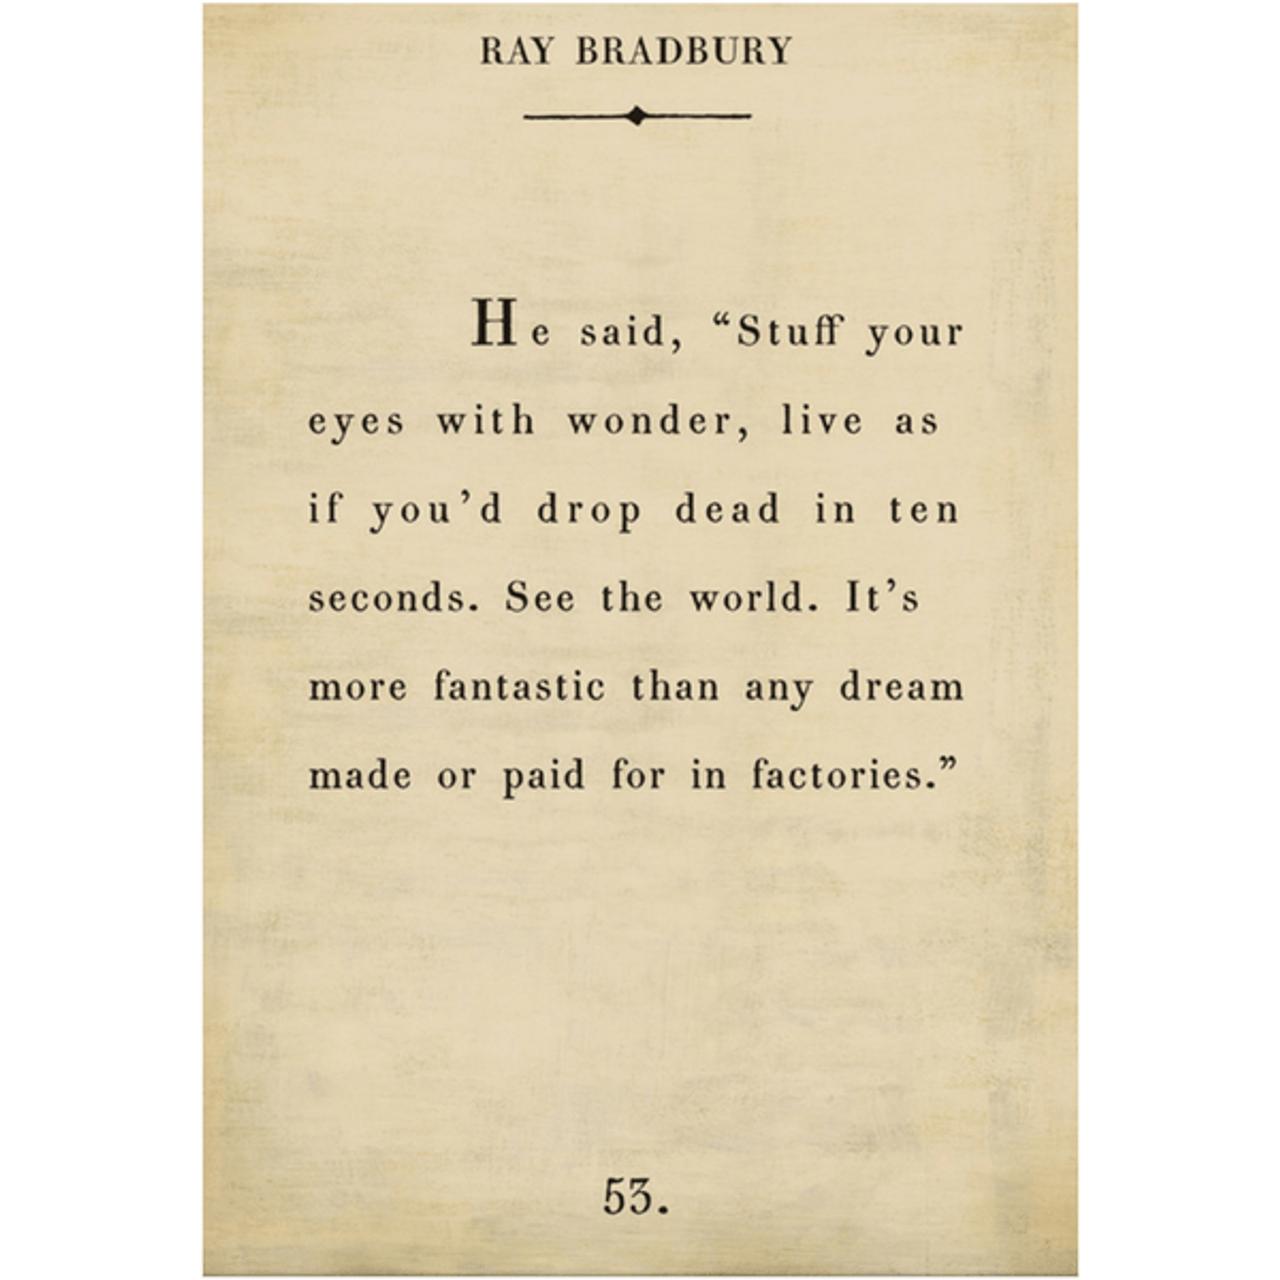 ray bradbury art print - cream with gallery wrap frame